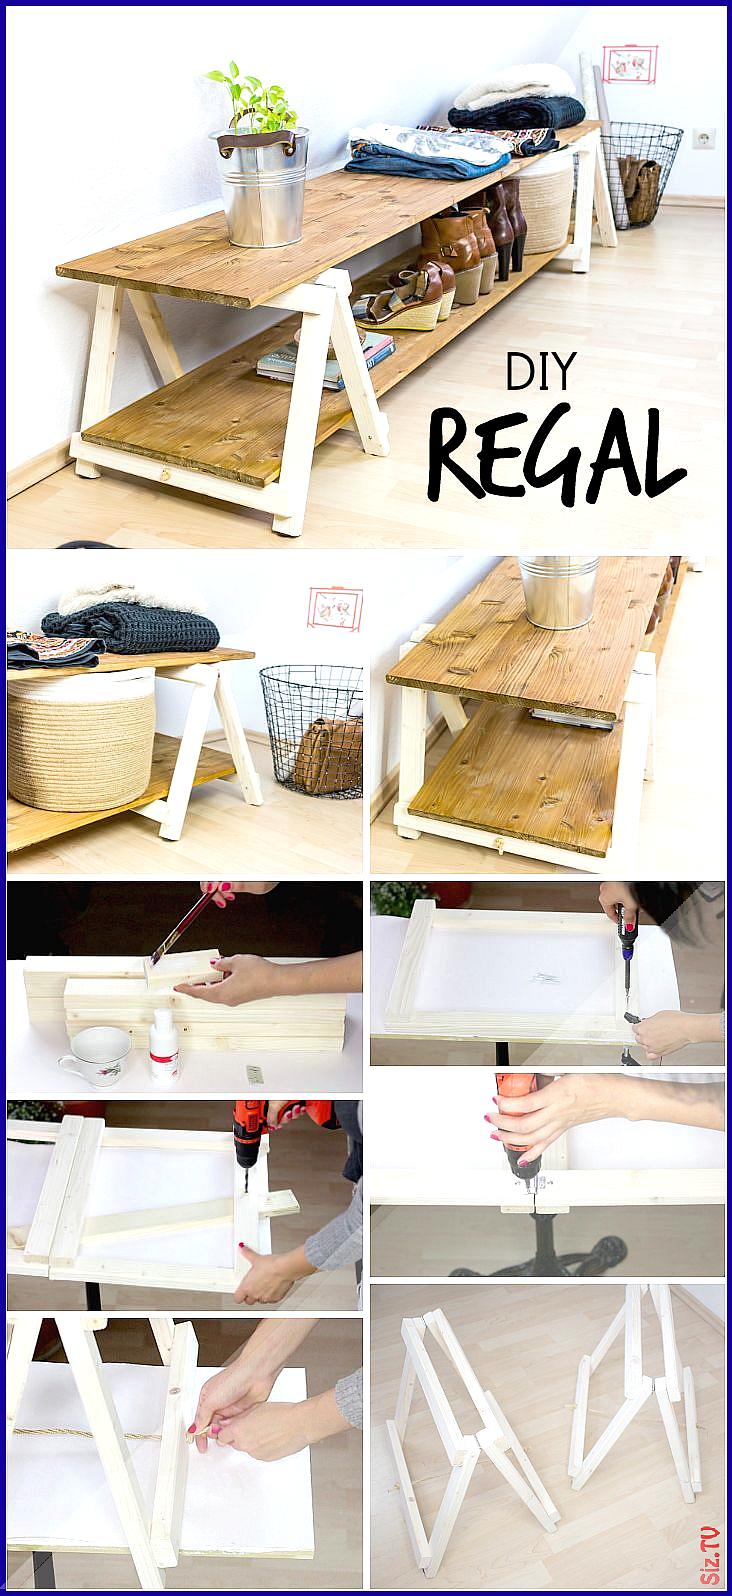 DIY Regal Regal bauen mit Mini Klappb cken DIY Regal Regal bauen mit Mini Klappb cken Rabe A ...